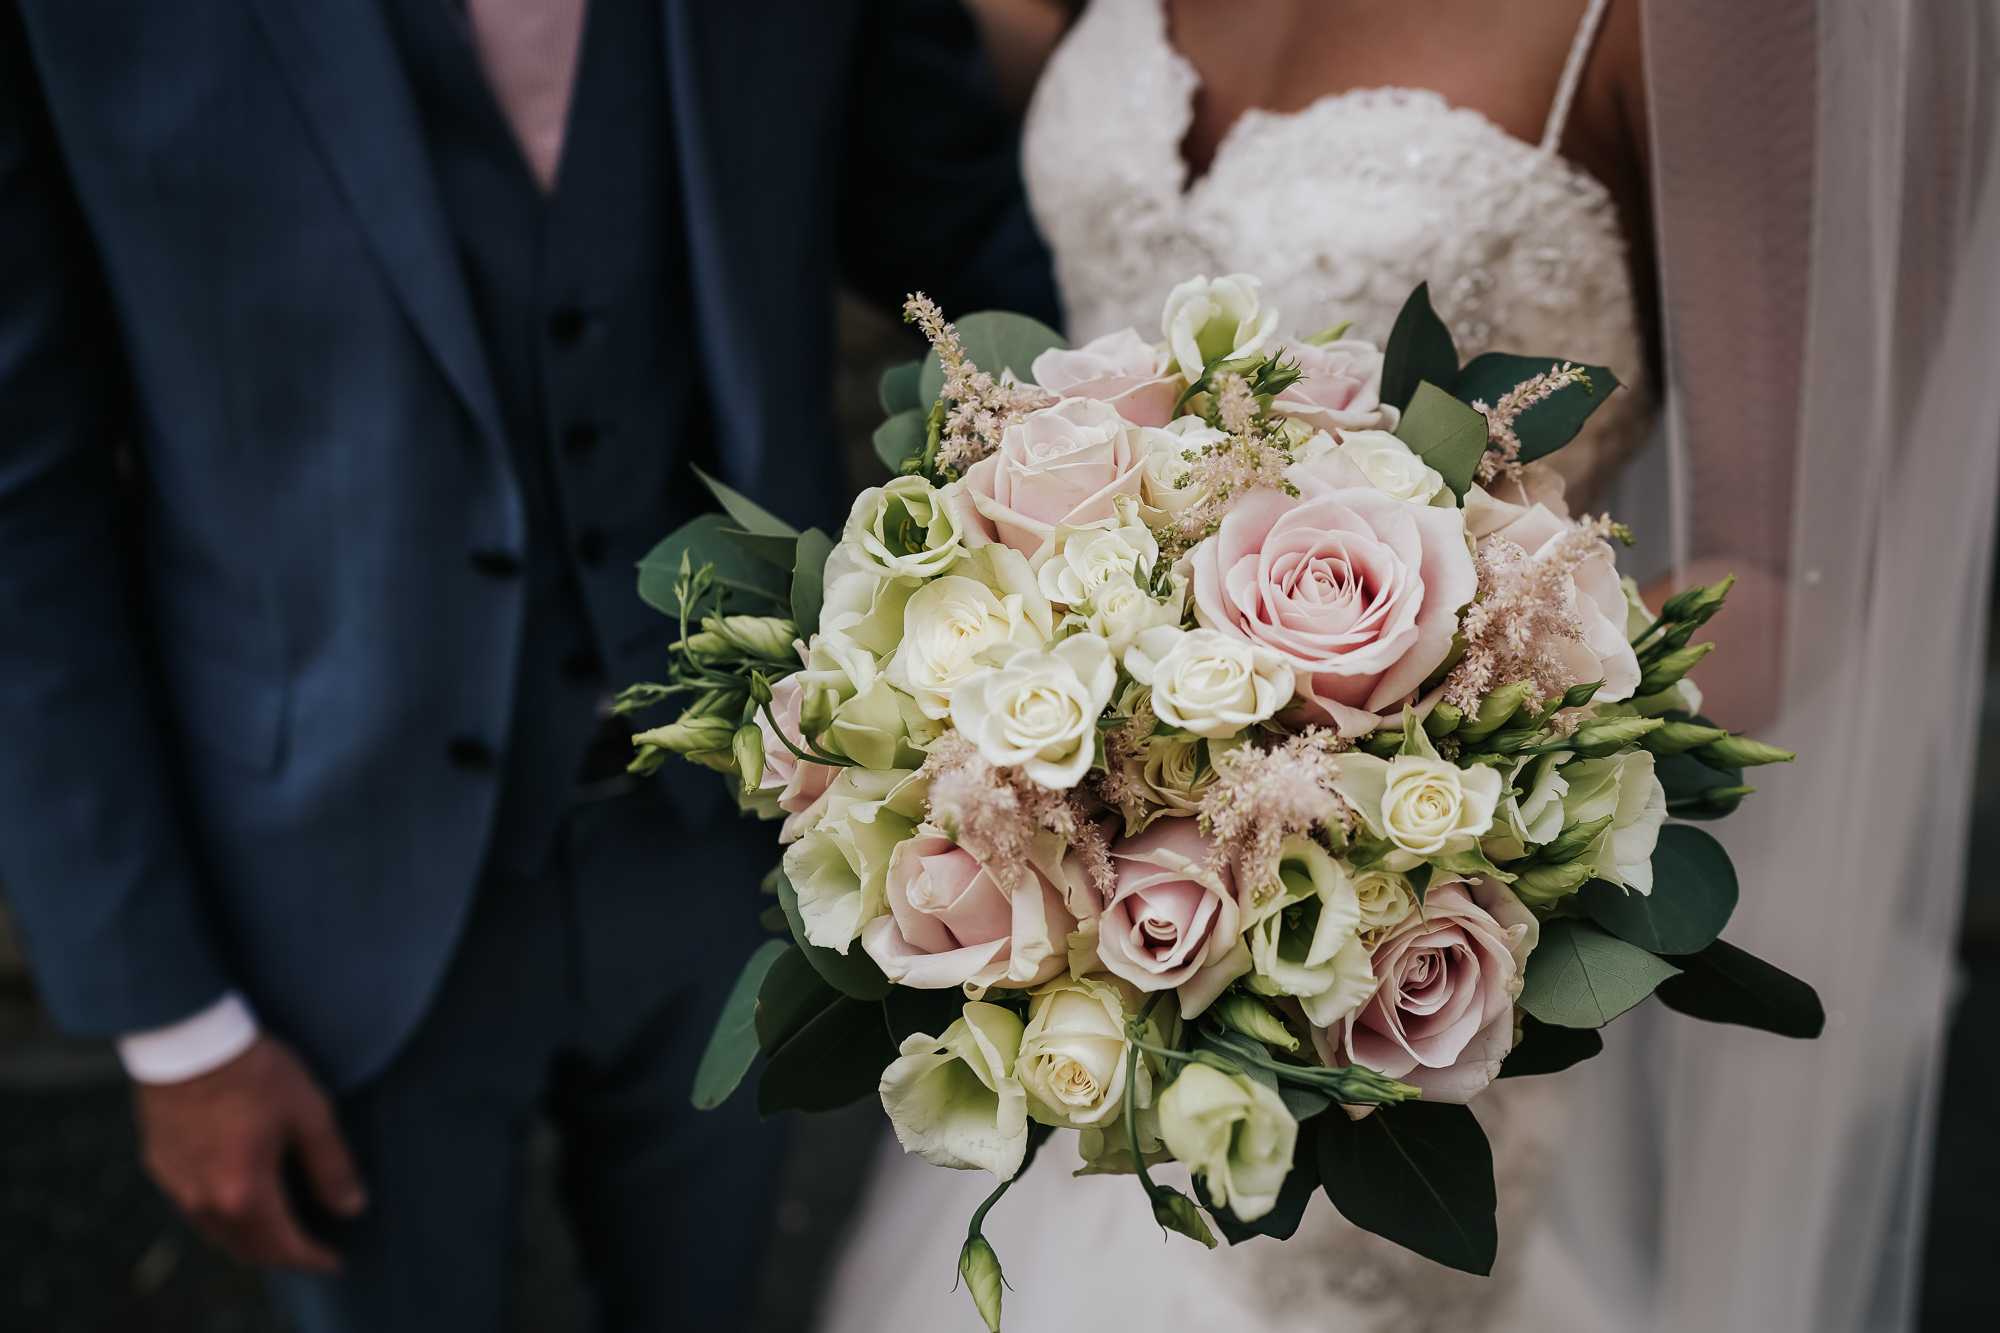 Thornton Manor Lakeside Marquee Wedding Photographer  (28 of 53).jpg